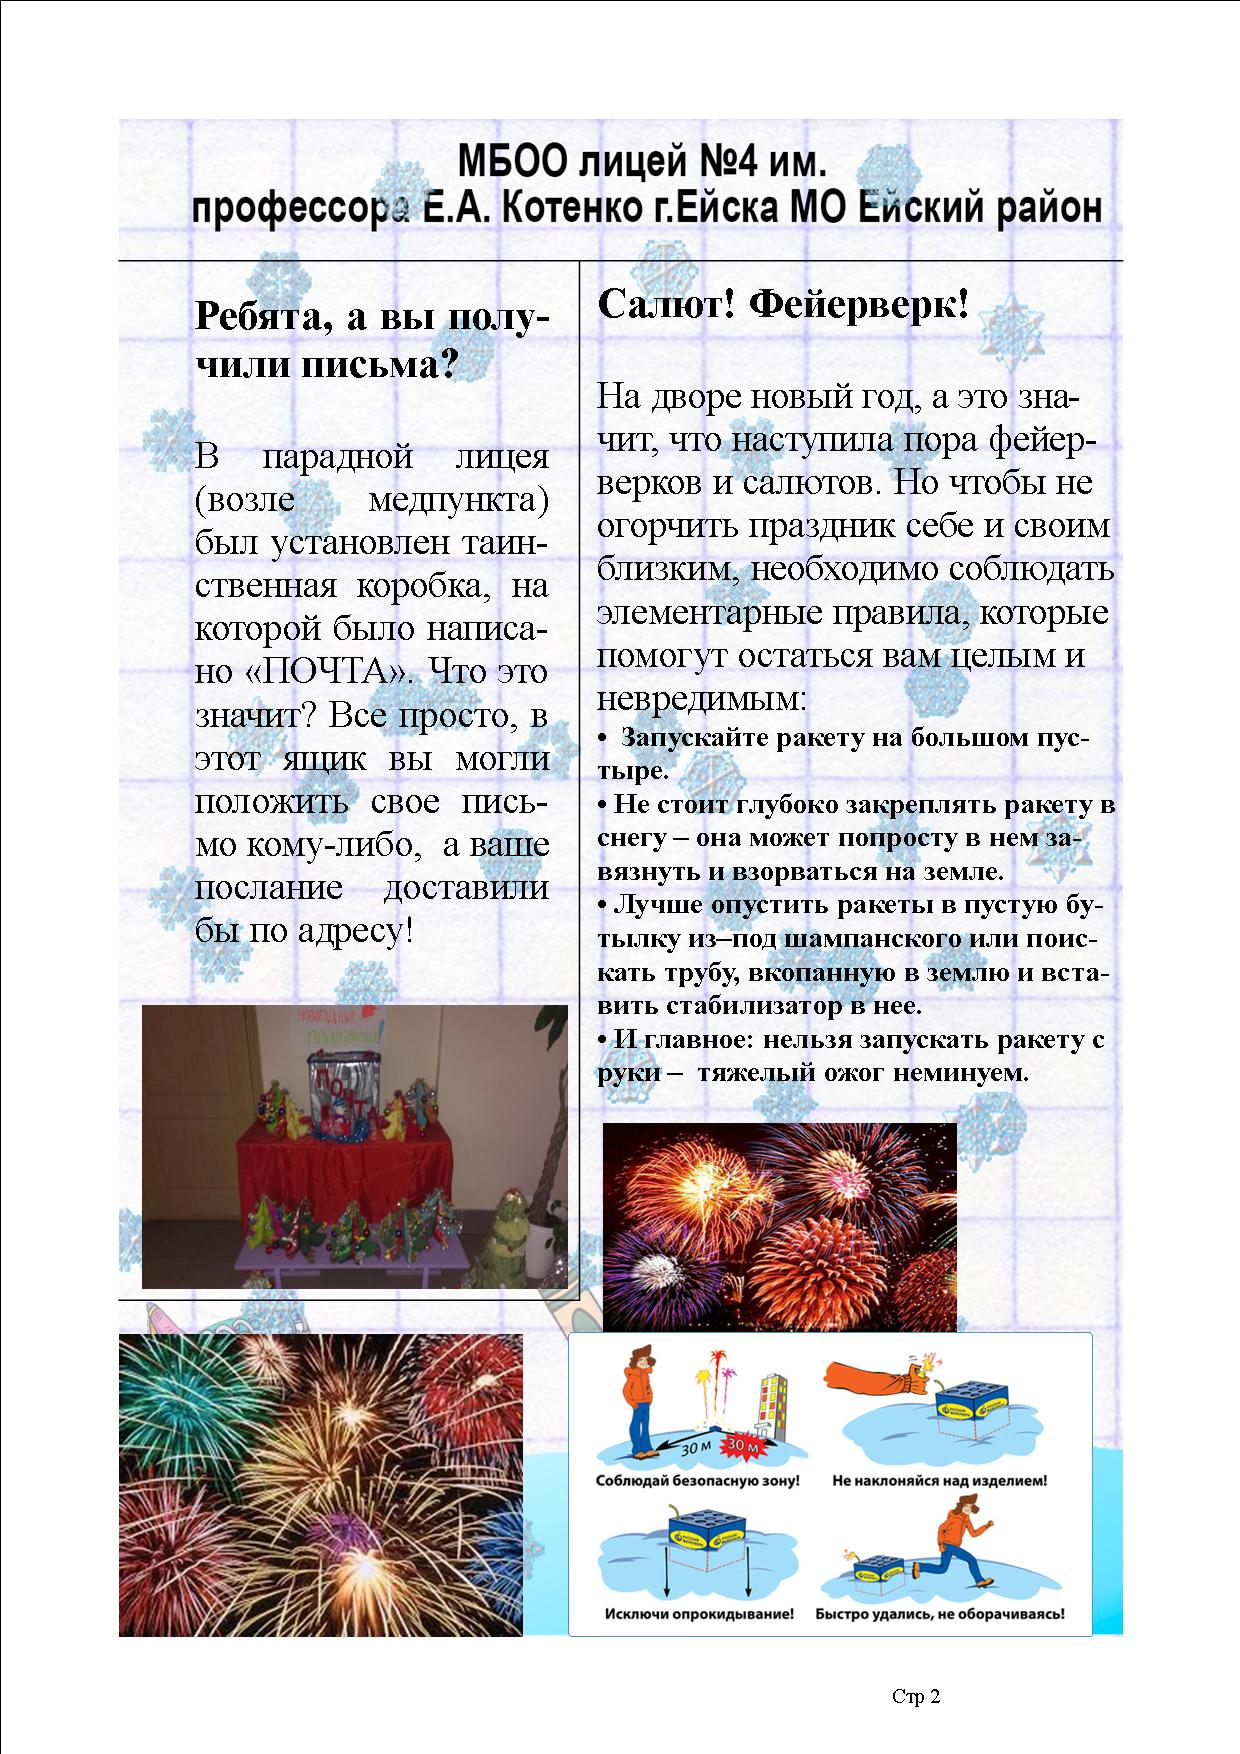 Publikaciya-Dekabr-2014-2